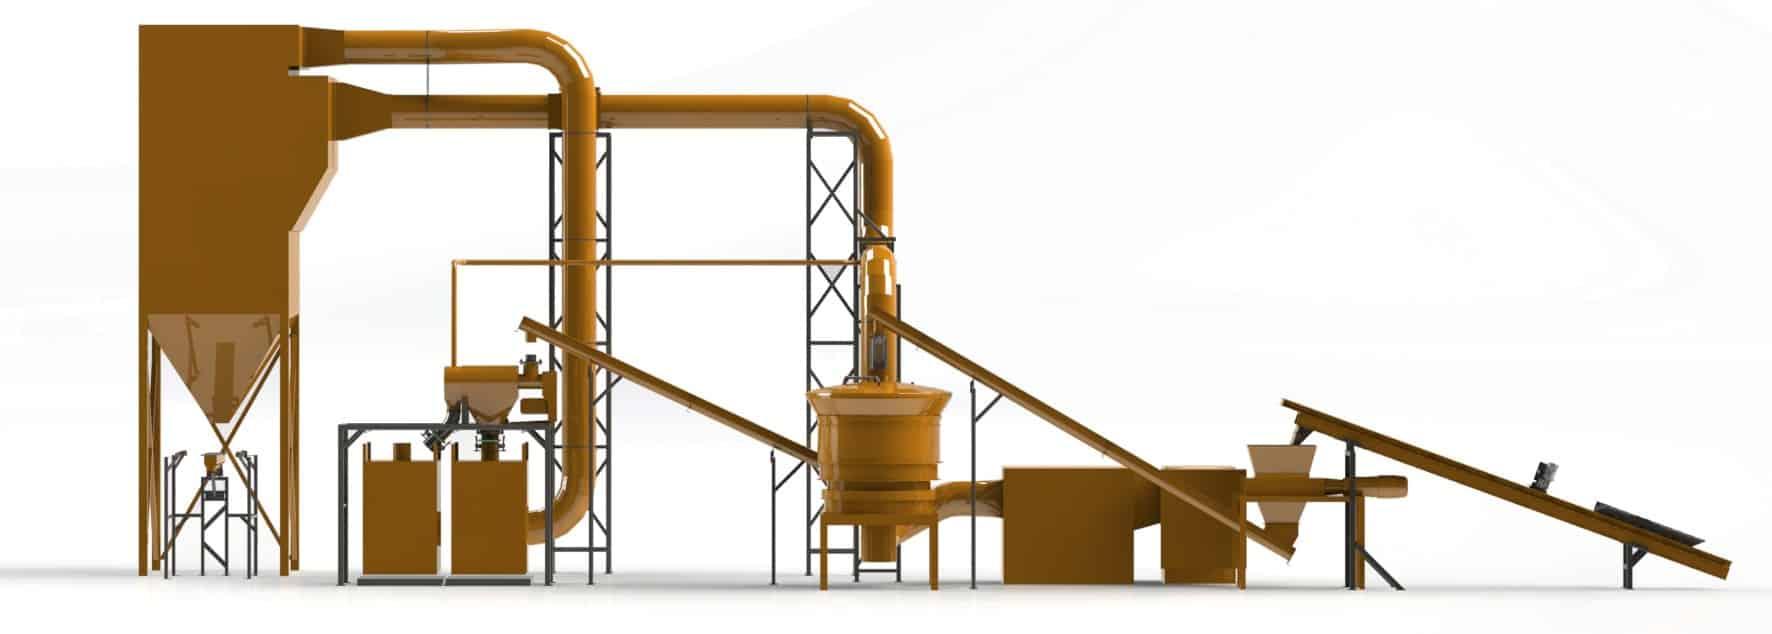 ABM Drying System Model